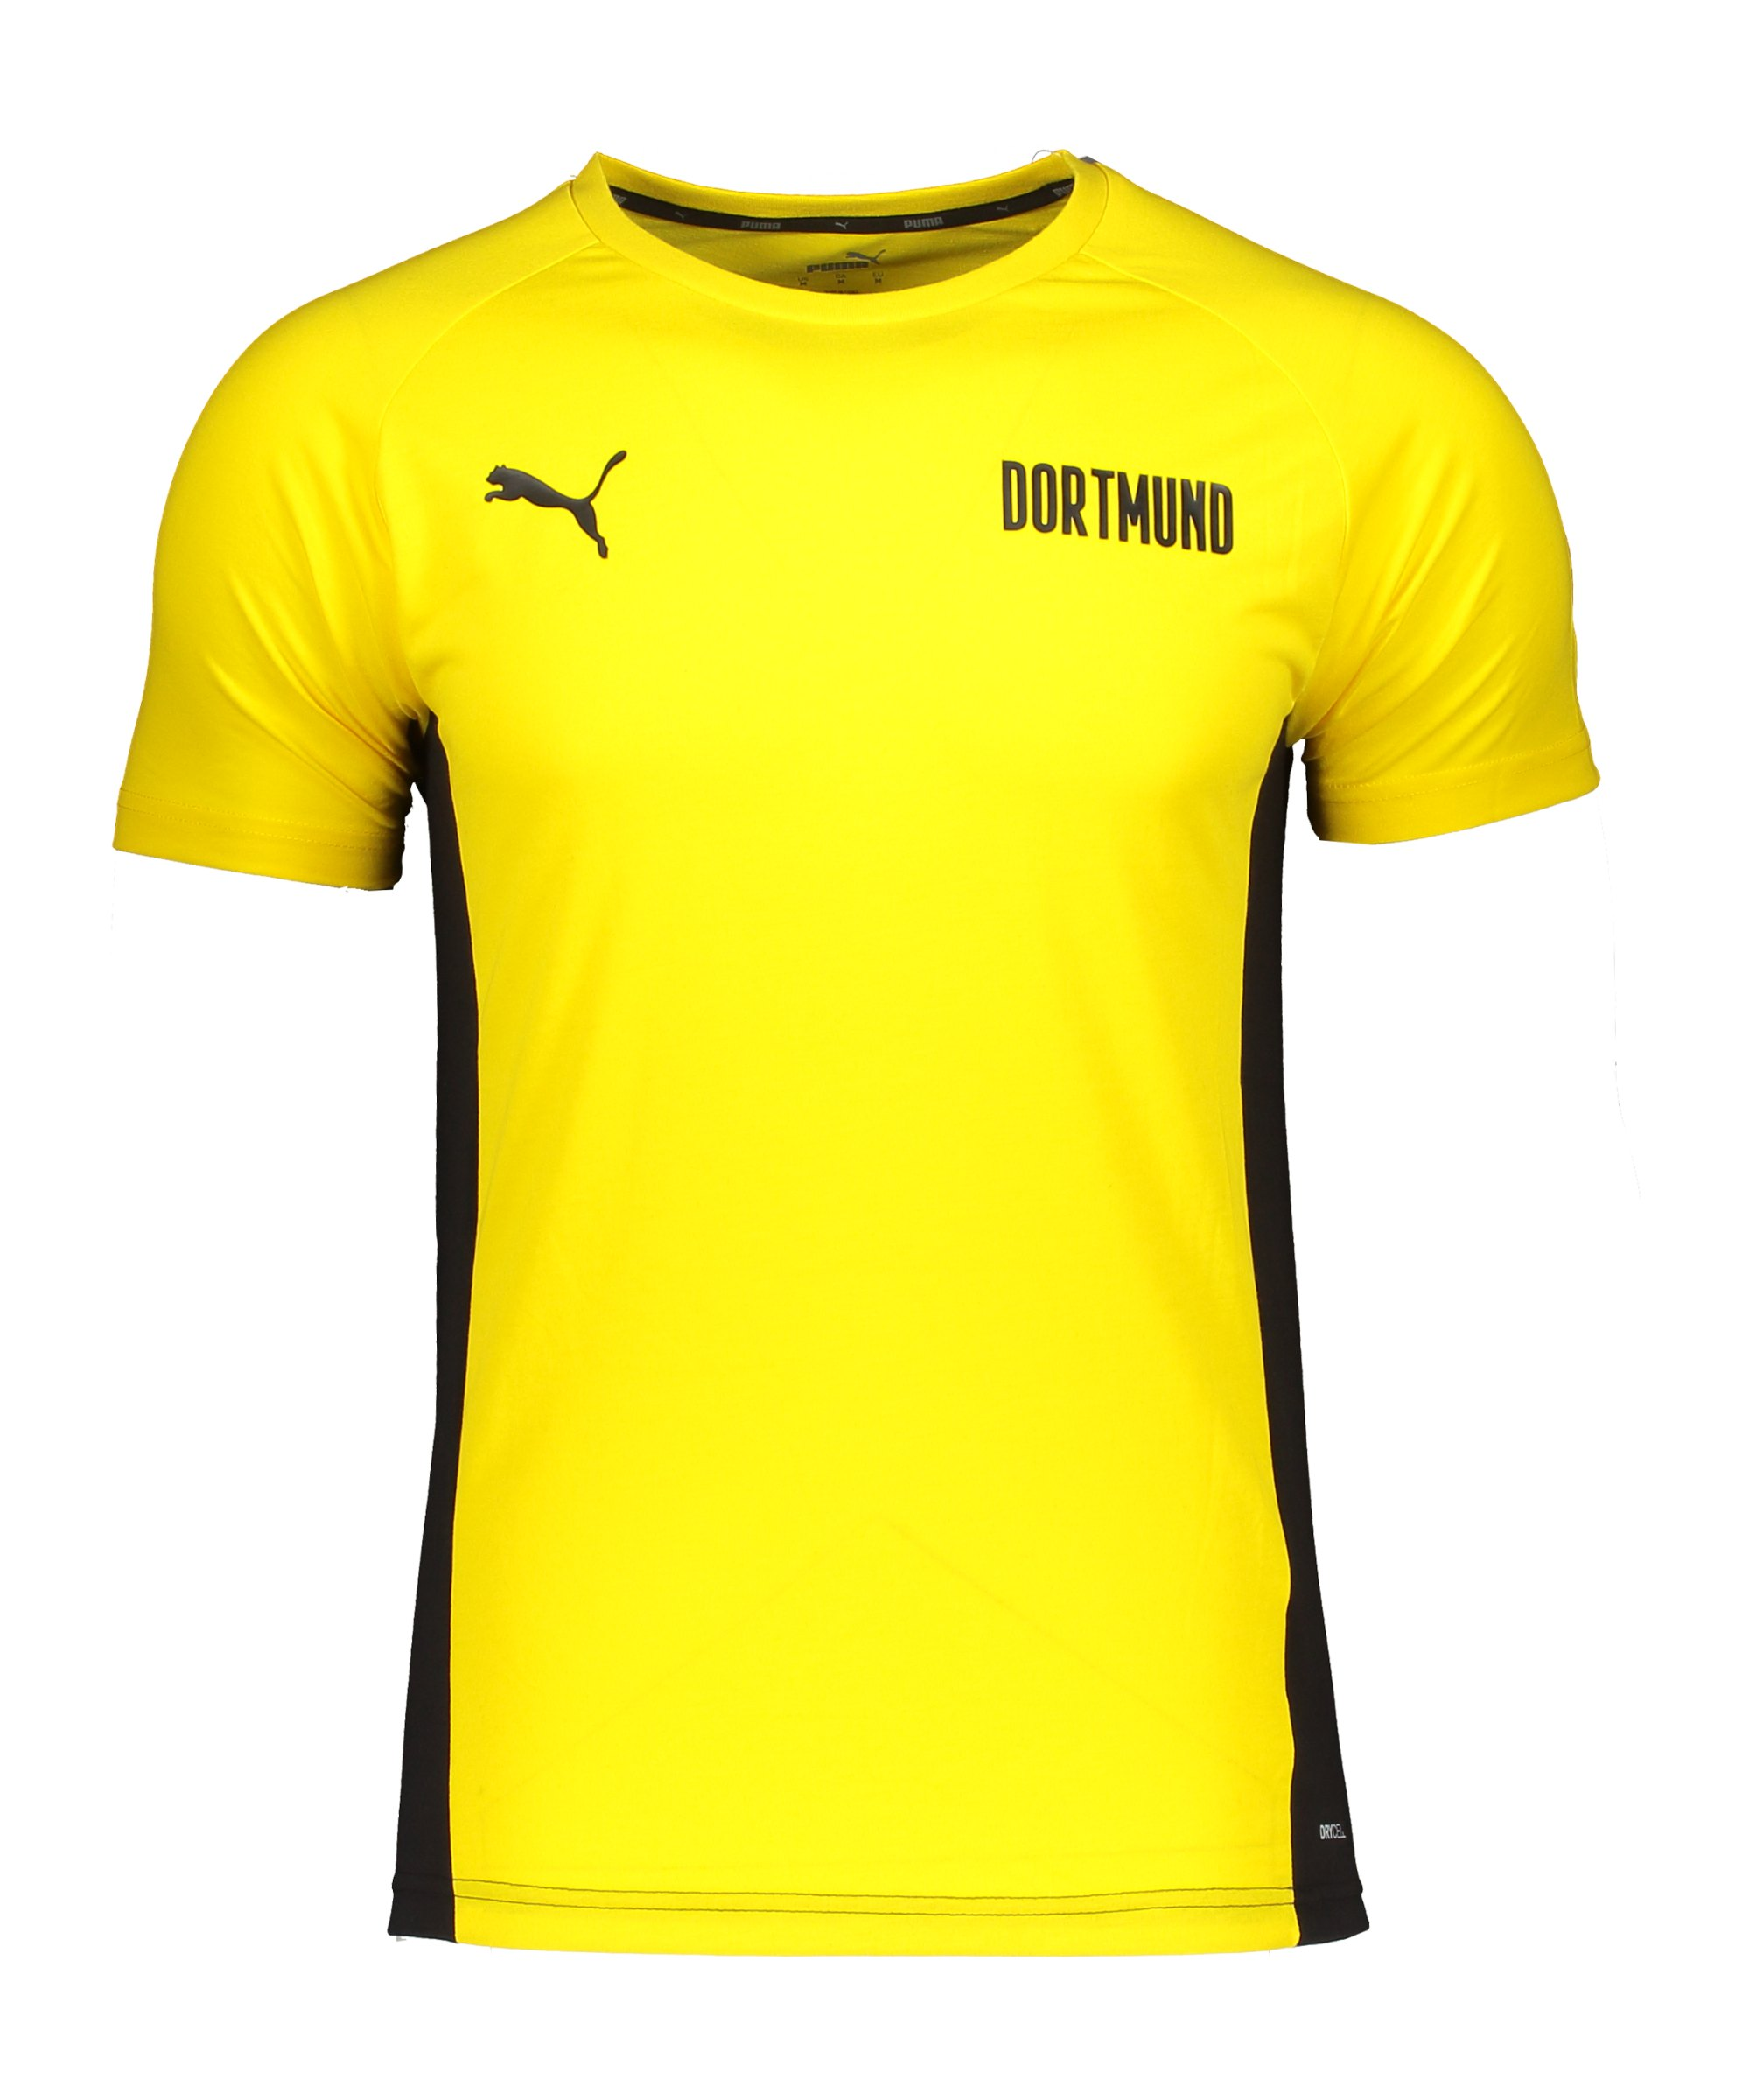 PUMA BVB Dortmund Evostripe T-Shirt Gelb F01 - gelb